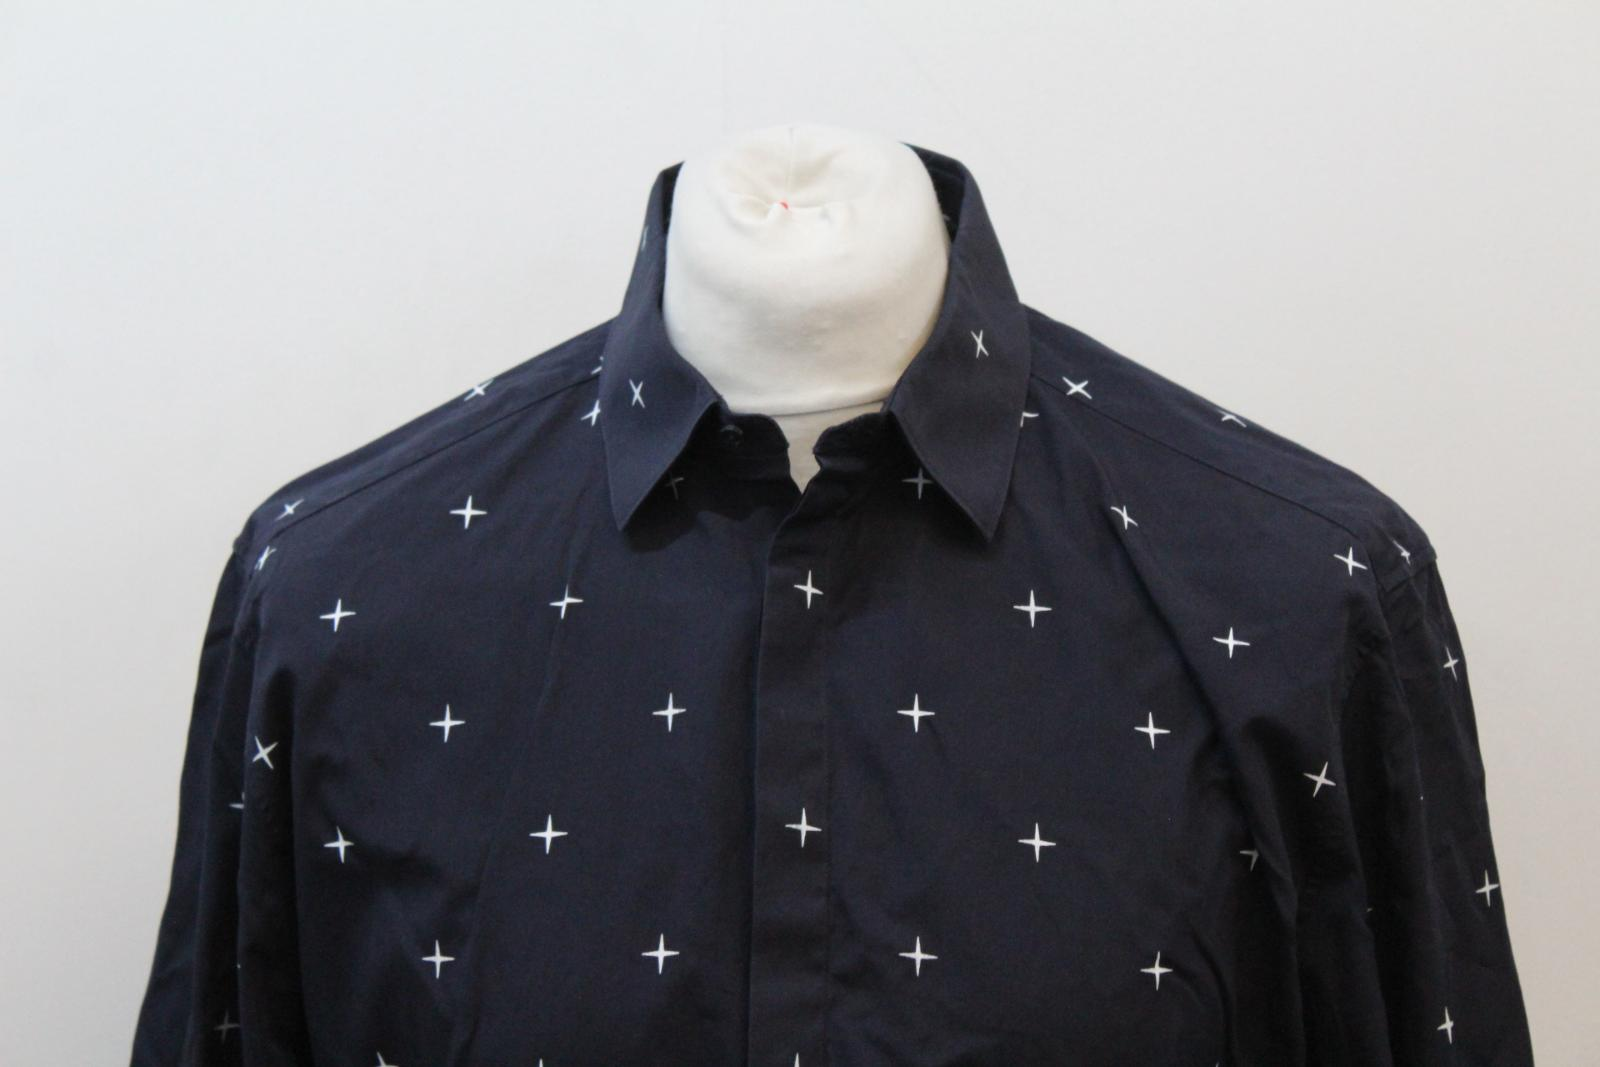 Neil-Barrett-Hombre-Azul-Marino-Blanco-Cuello-De-Camisa-formal-calce-Cruz-16-5-034-42cm miniatura 3